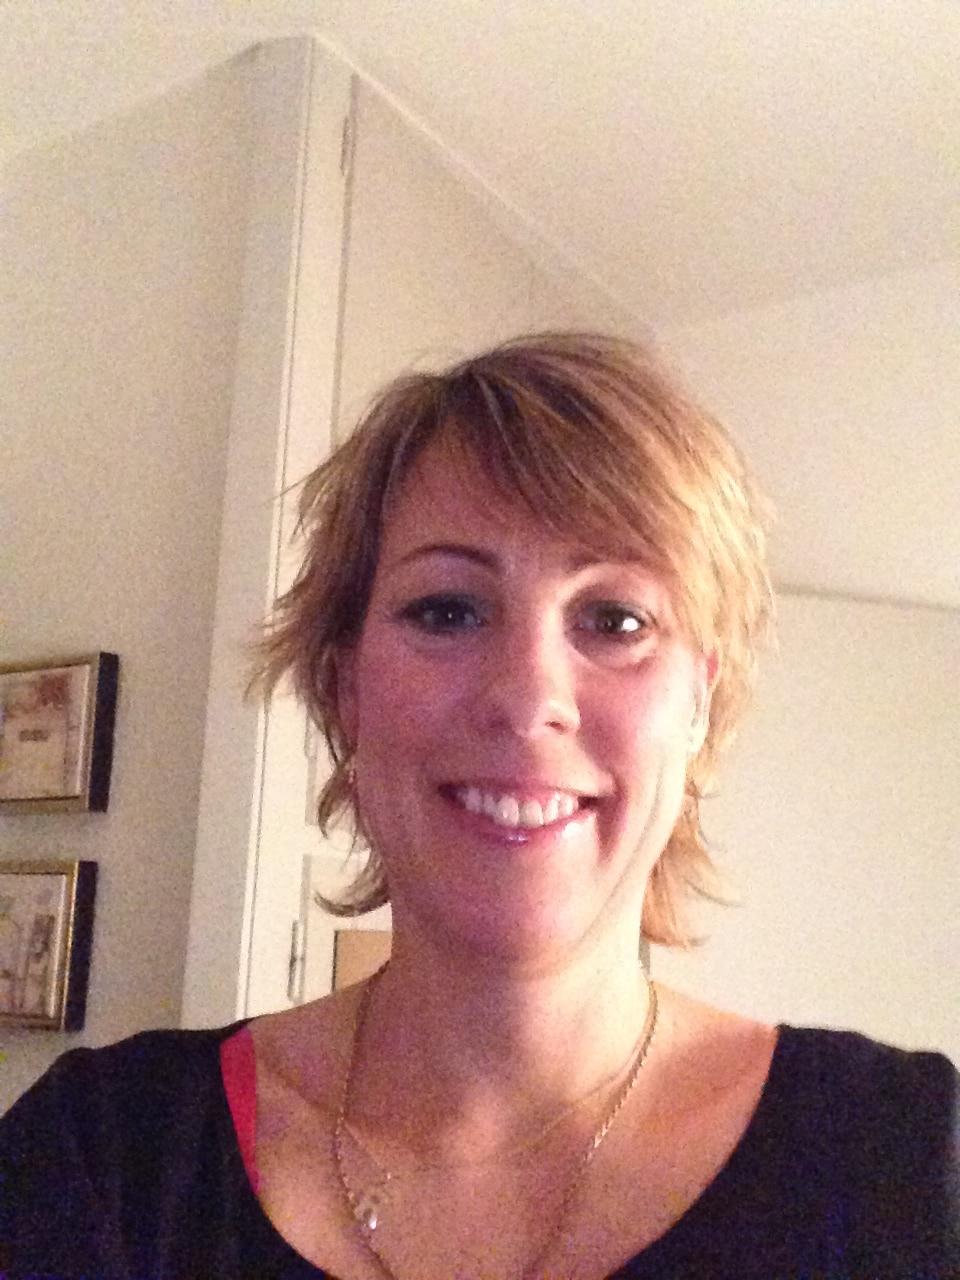 Anja from Frederiksberg